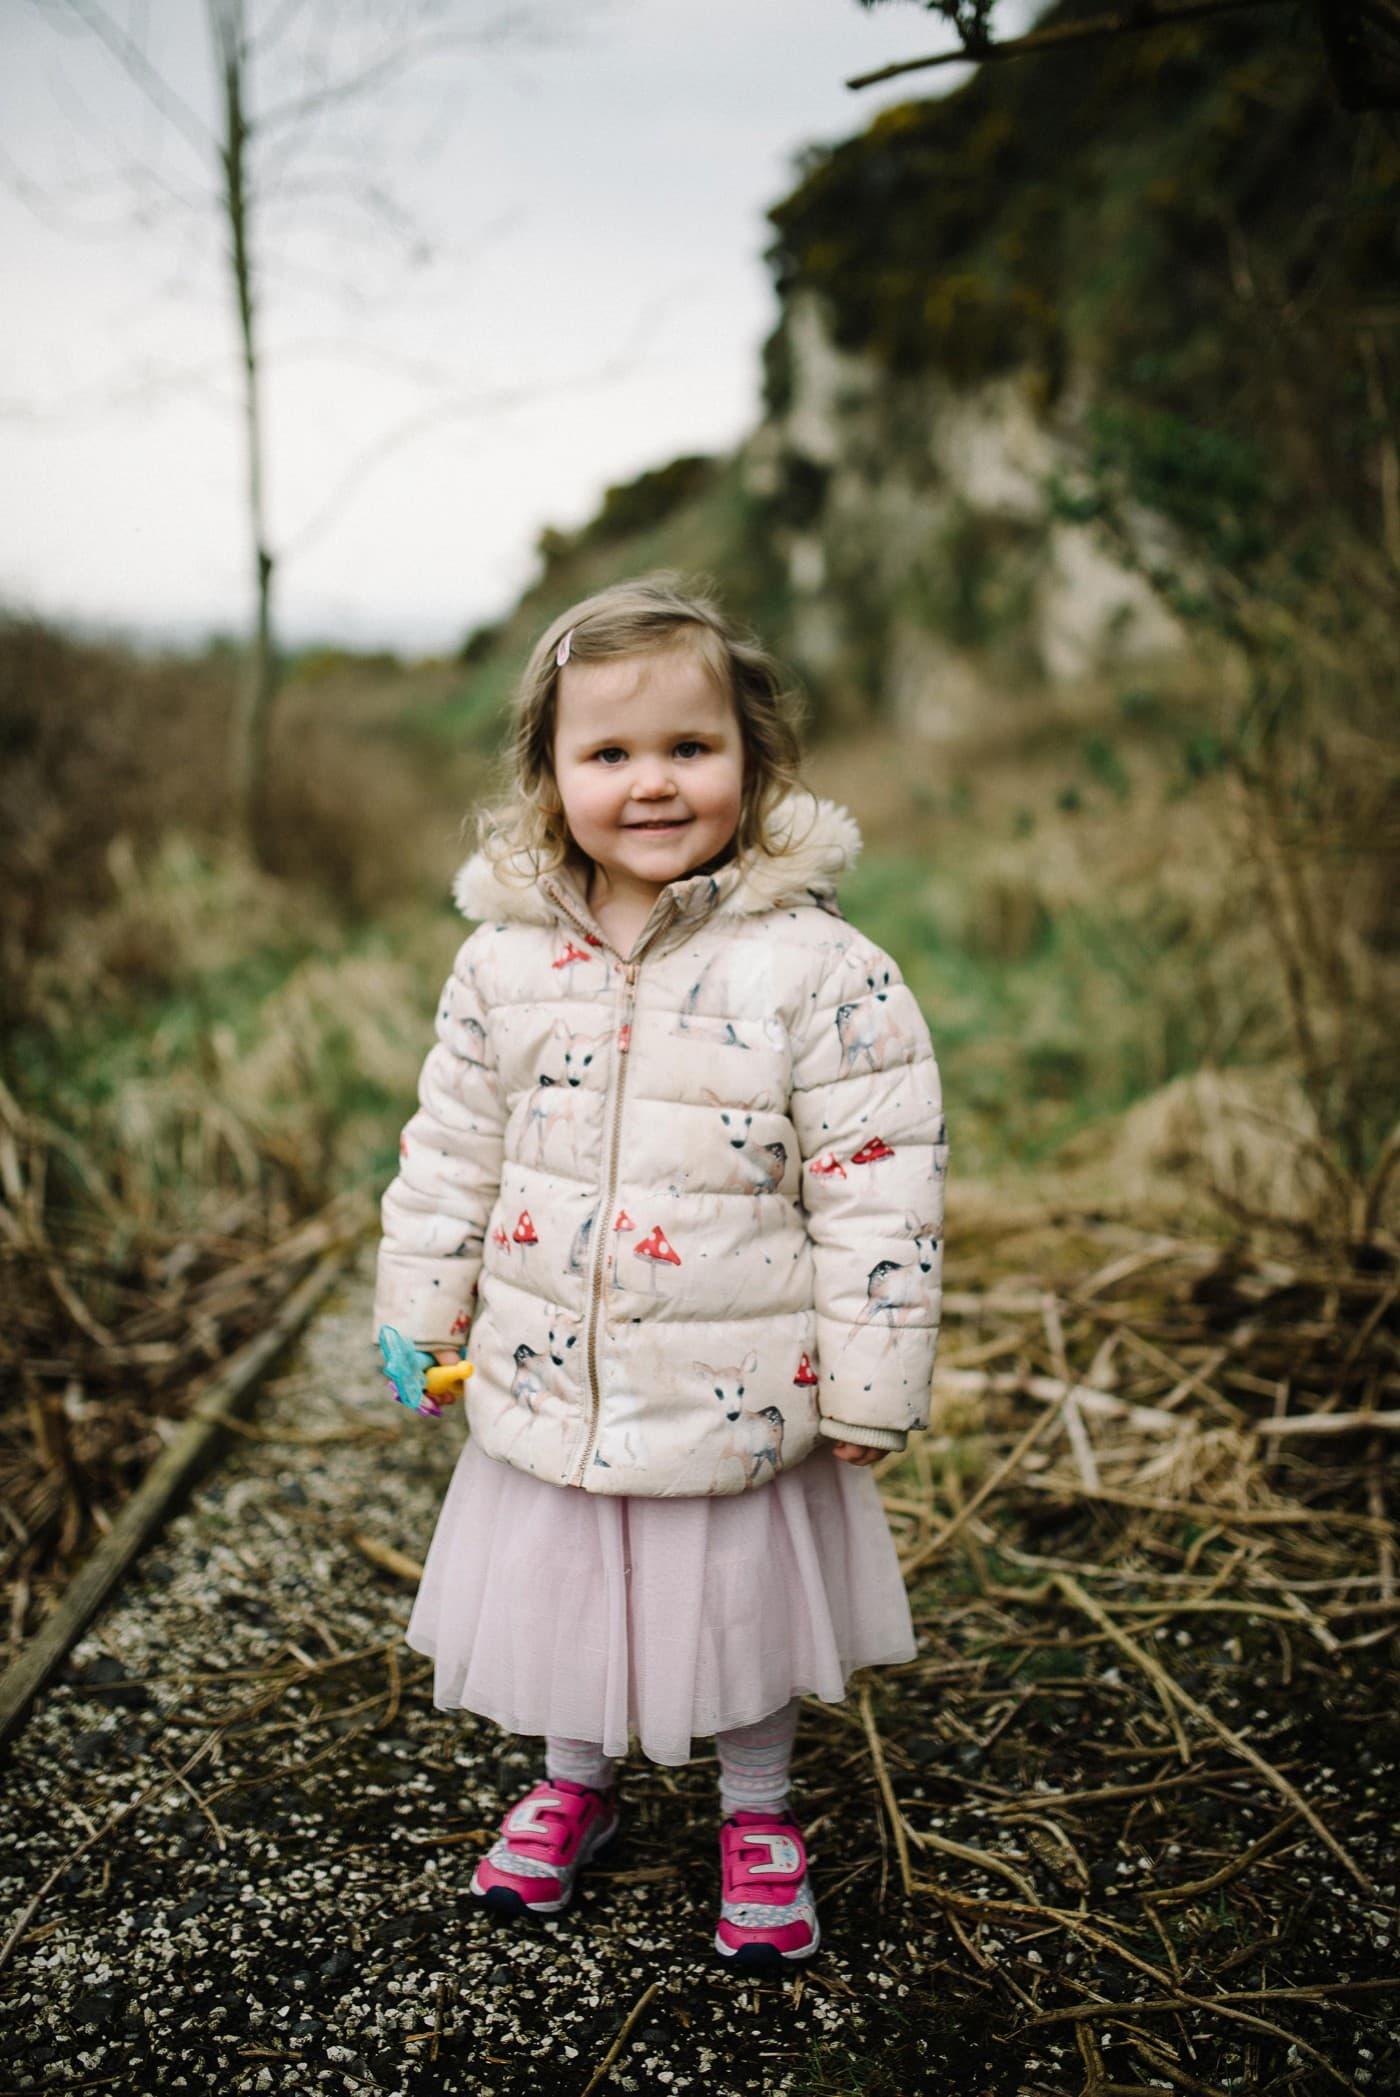 https://www.epiclovephotography.com/family-photographer-northern-ireland/